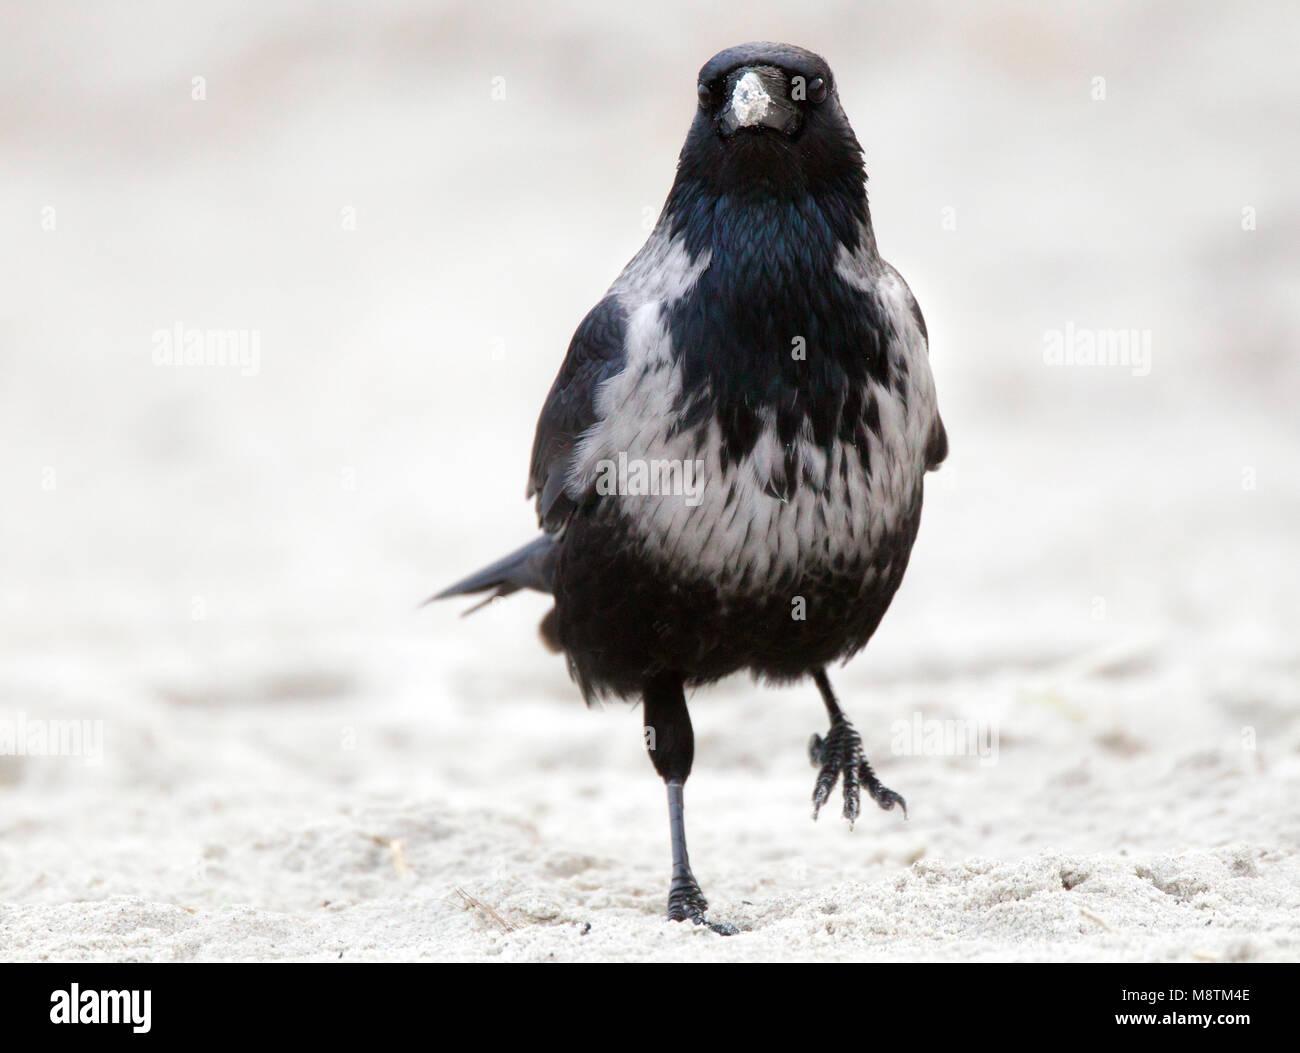 Hybride Bonte Kraai x Zwarte Kraai lopend in zand; Hybrid Hooded Crow x Carrion Crow walking in sand Stock Photo